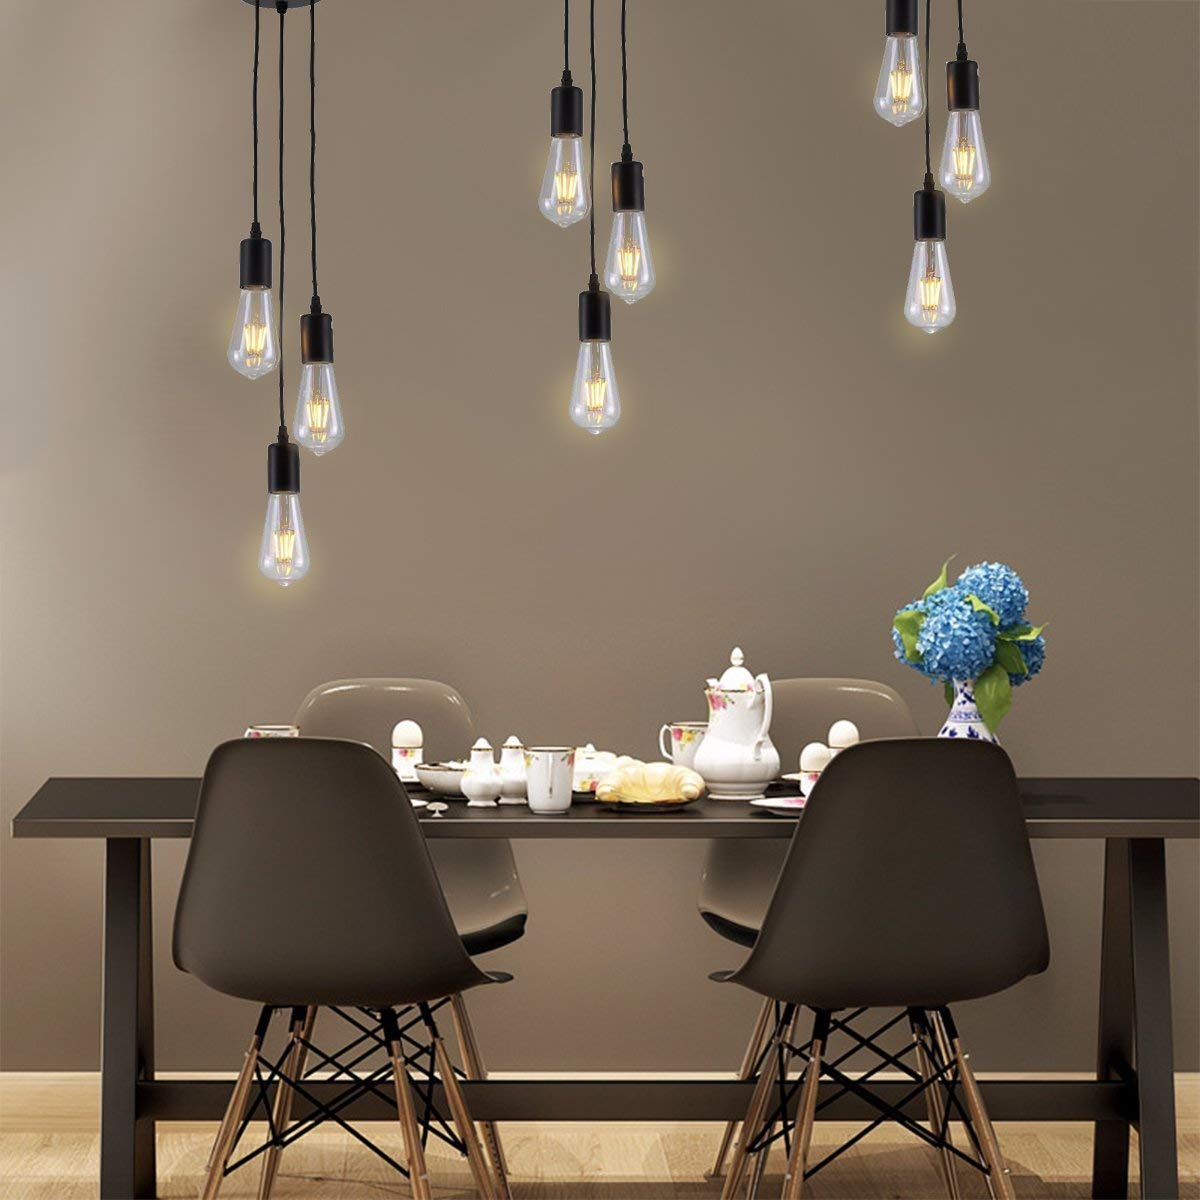 PIANUO Retro Industrial Chandelier Pendant Lights 3 Head E26 Lamps Vintage Classic Edison Lamps Adjustable DIY Ceiling Lamps Ceiling Lights(No Bulbs)